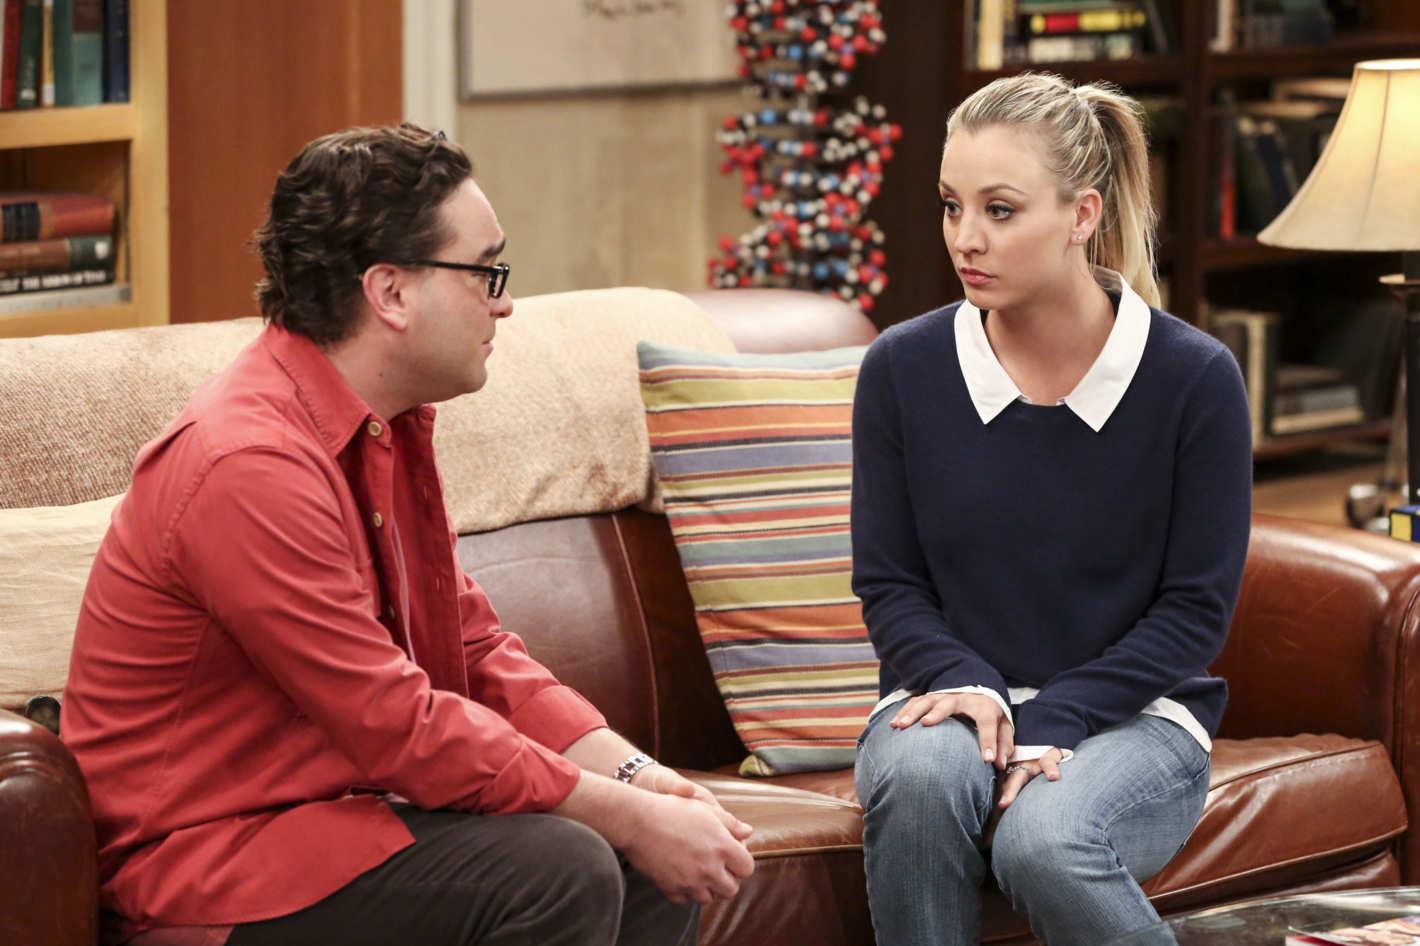 Funny big bang theory pictures 27 pics - Funny Big Bang Theory Pictures 27 Pics 28